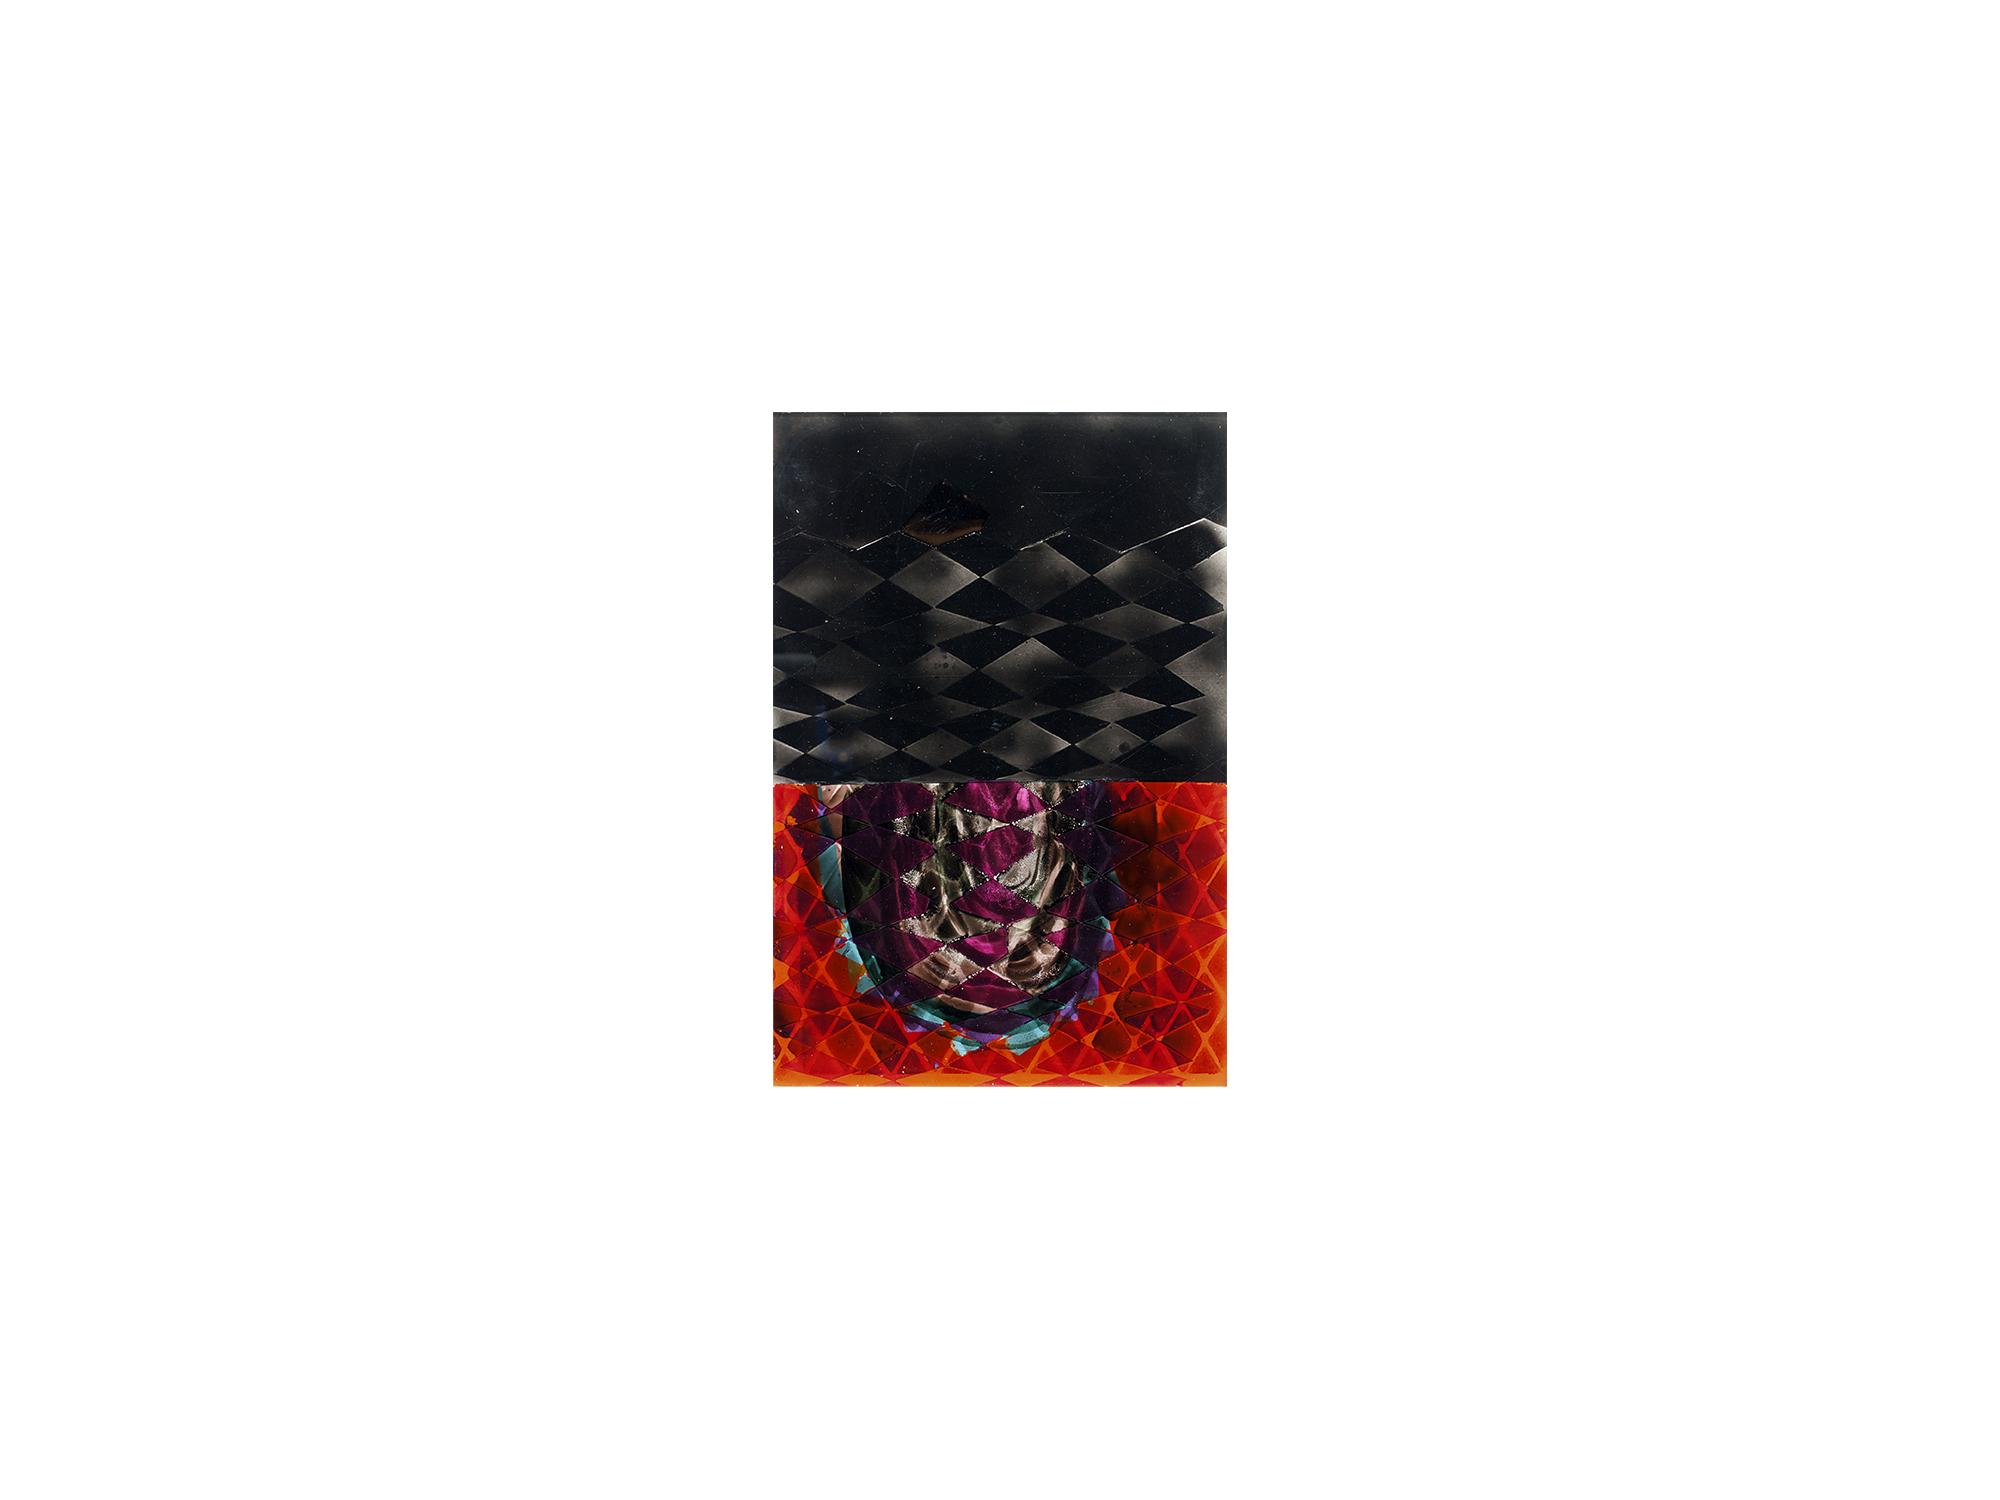 Michael Jäger   Bells #56 , 2015 acrylglas, oil, acrylic and lacquer on Dibond 39 x 26 cm